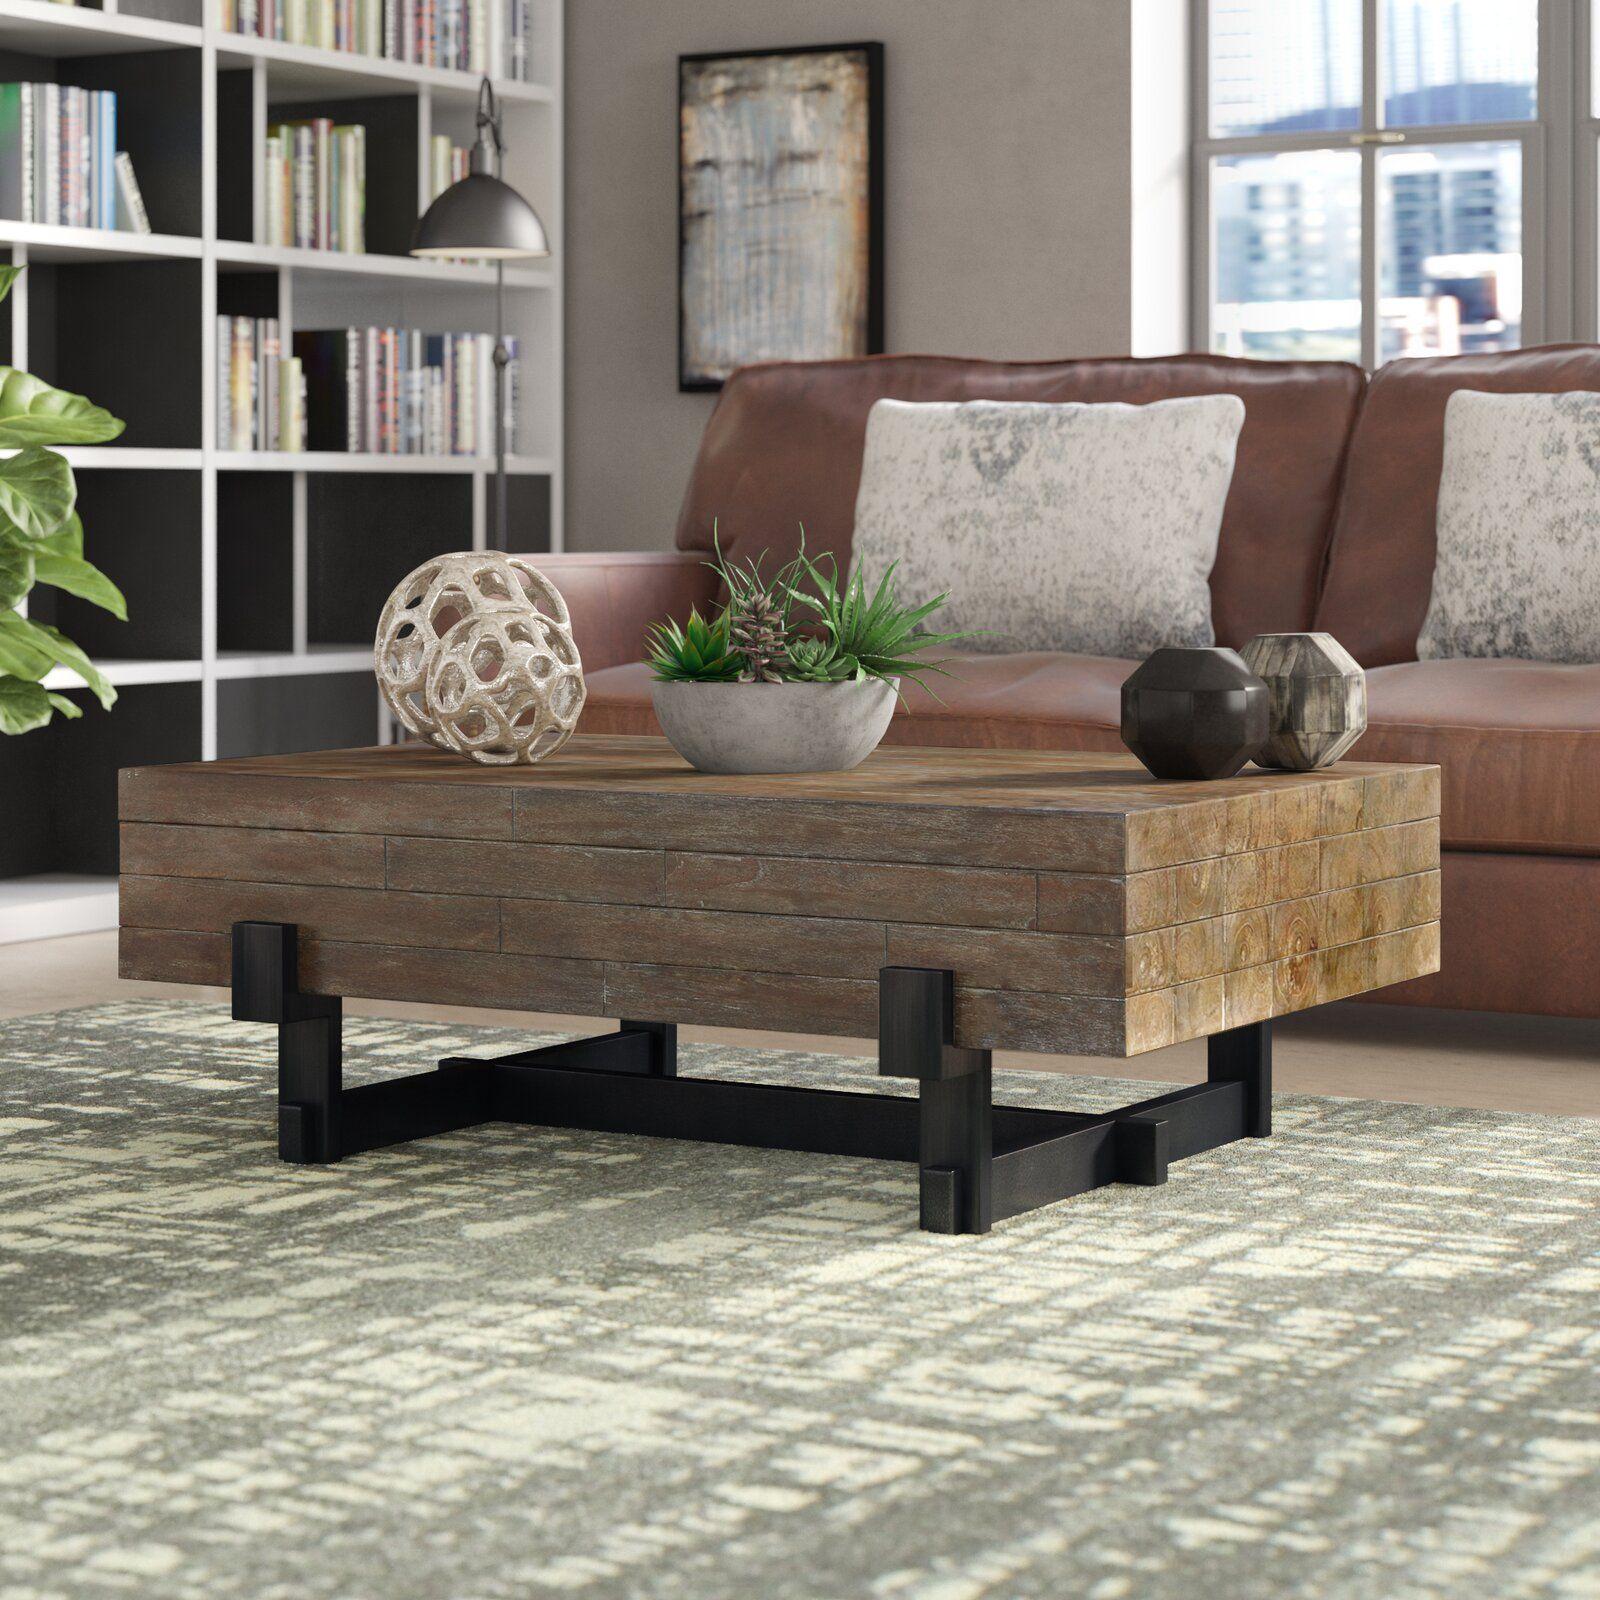 43++ Wayfair farmhouse coffee table with storage trends